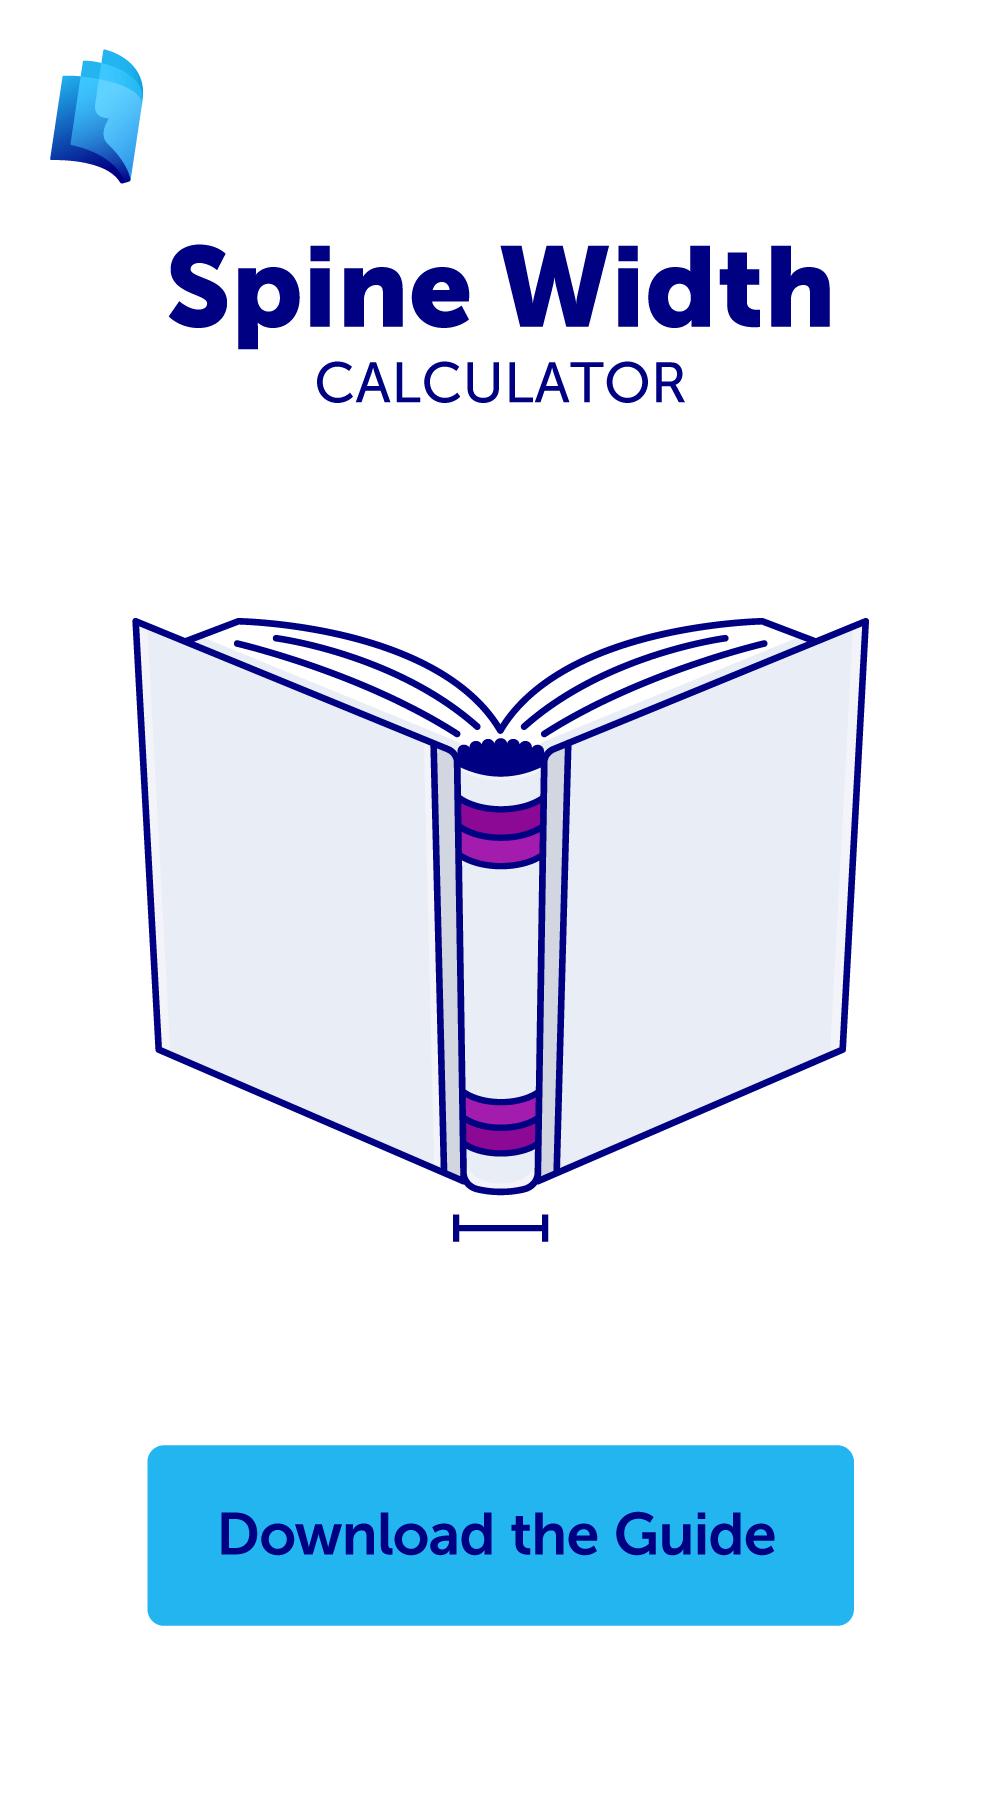 Spine Width Guide Ebook Download